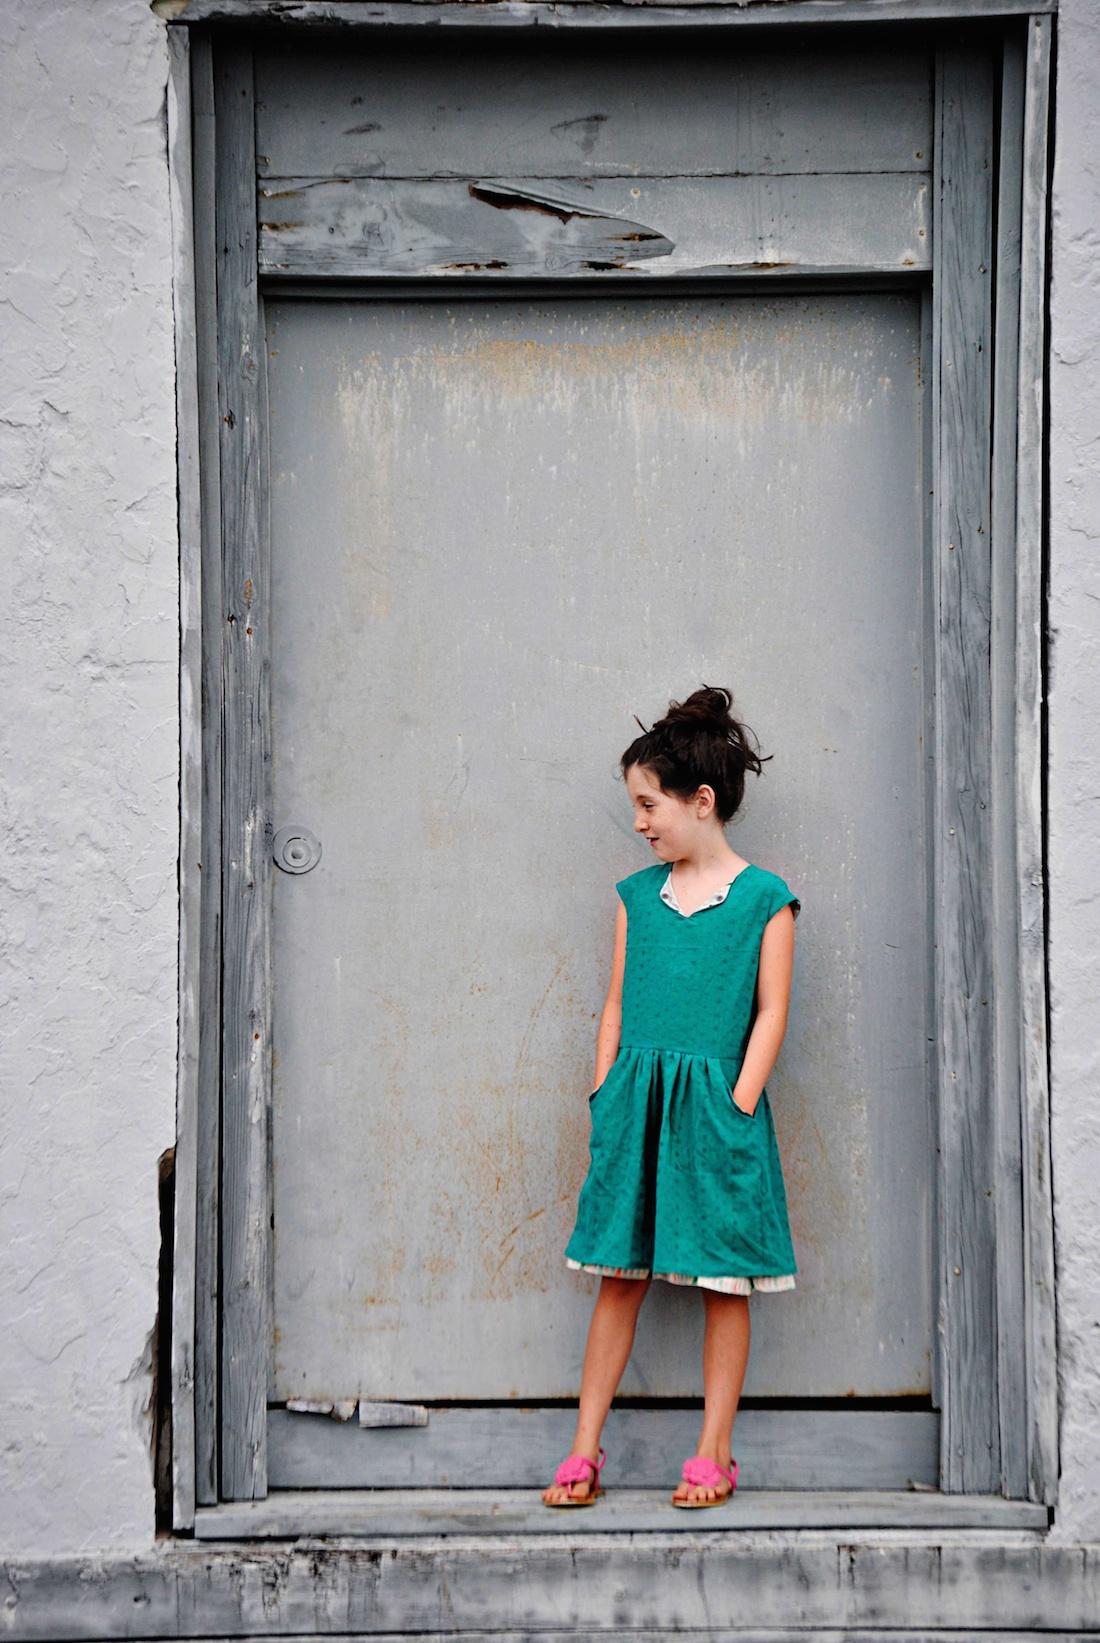 Compagnie-M_Lotta_dress_Dandeliondrift 2